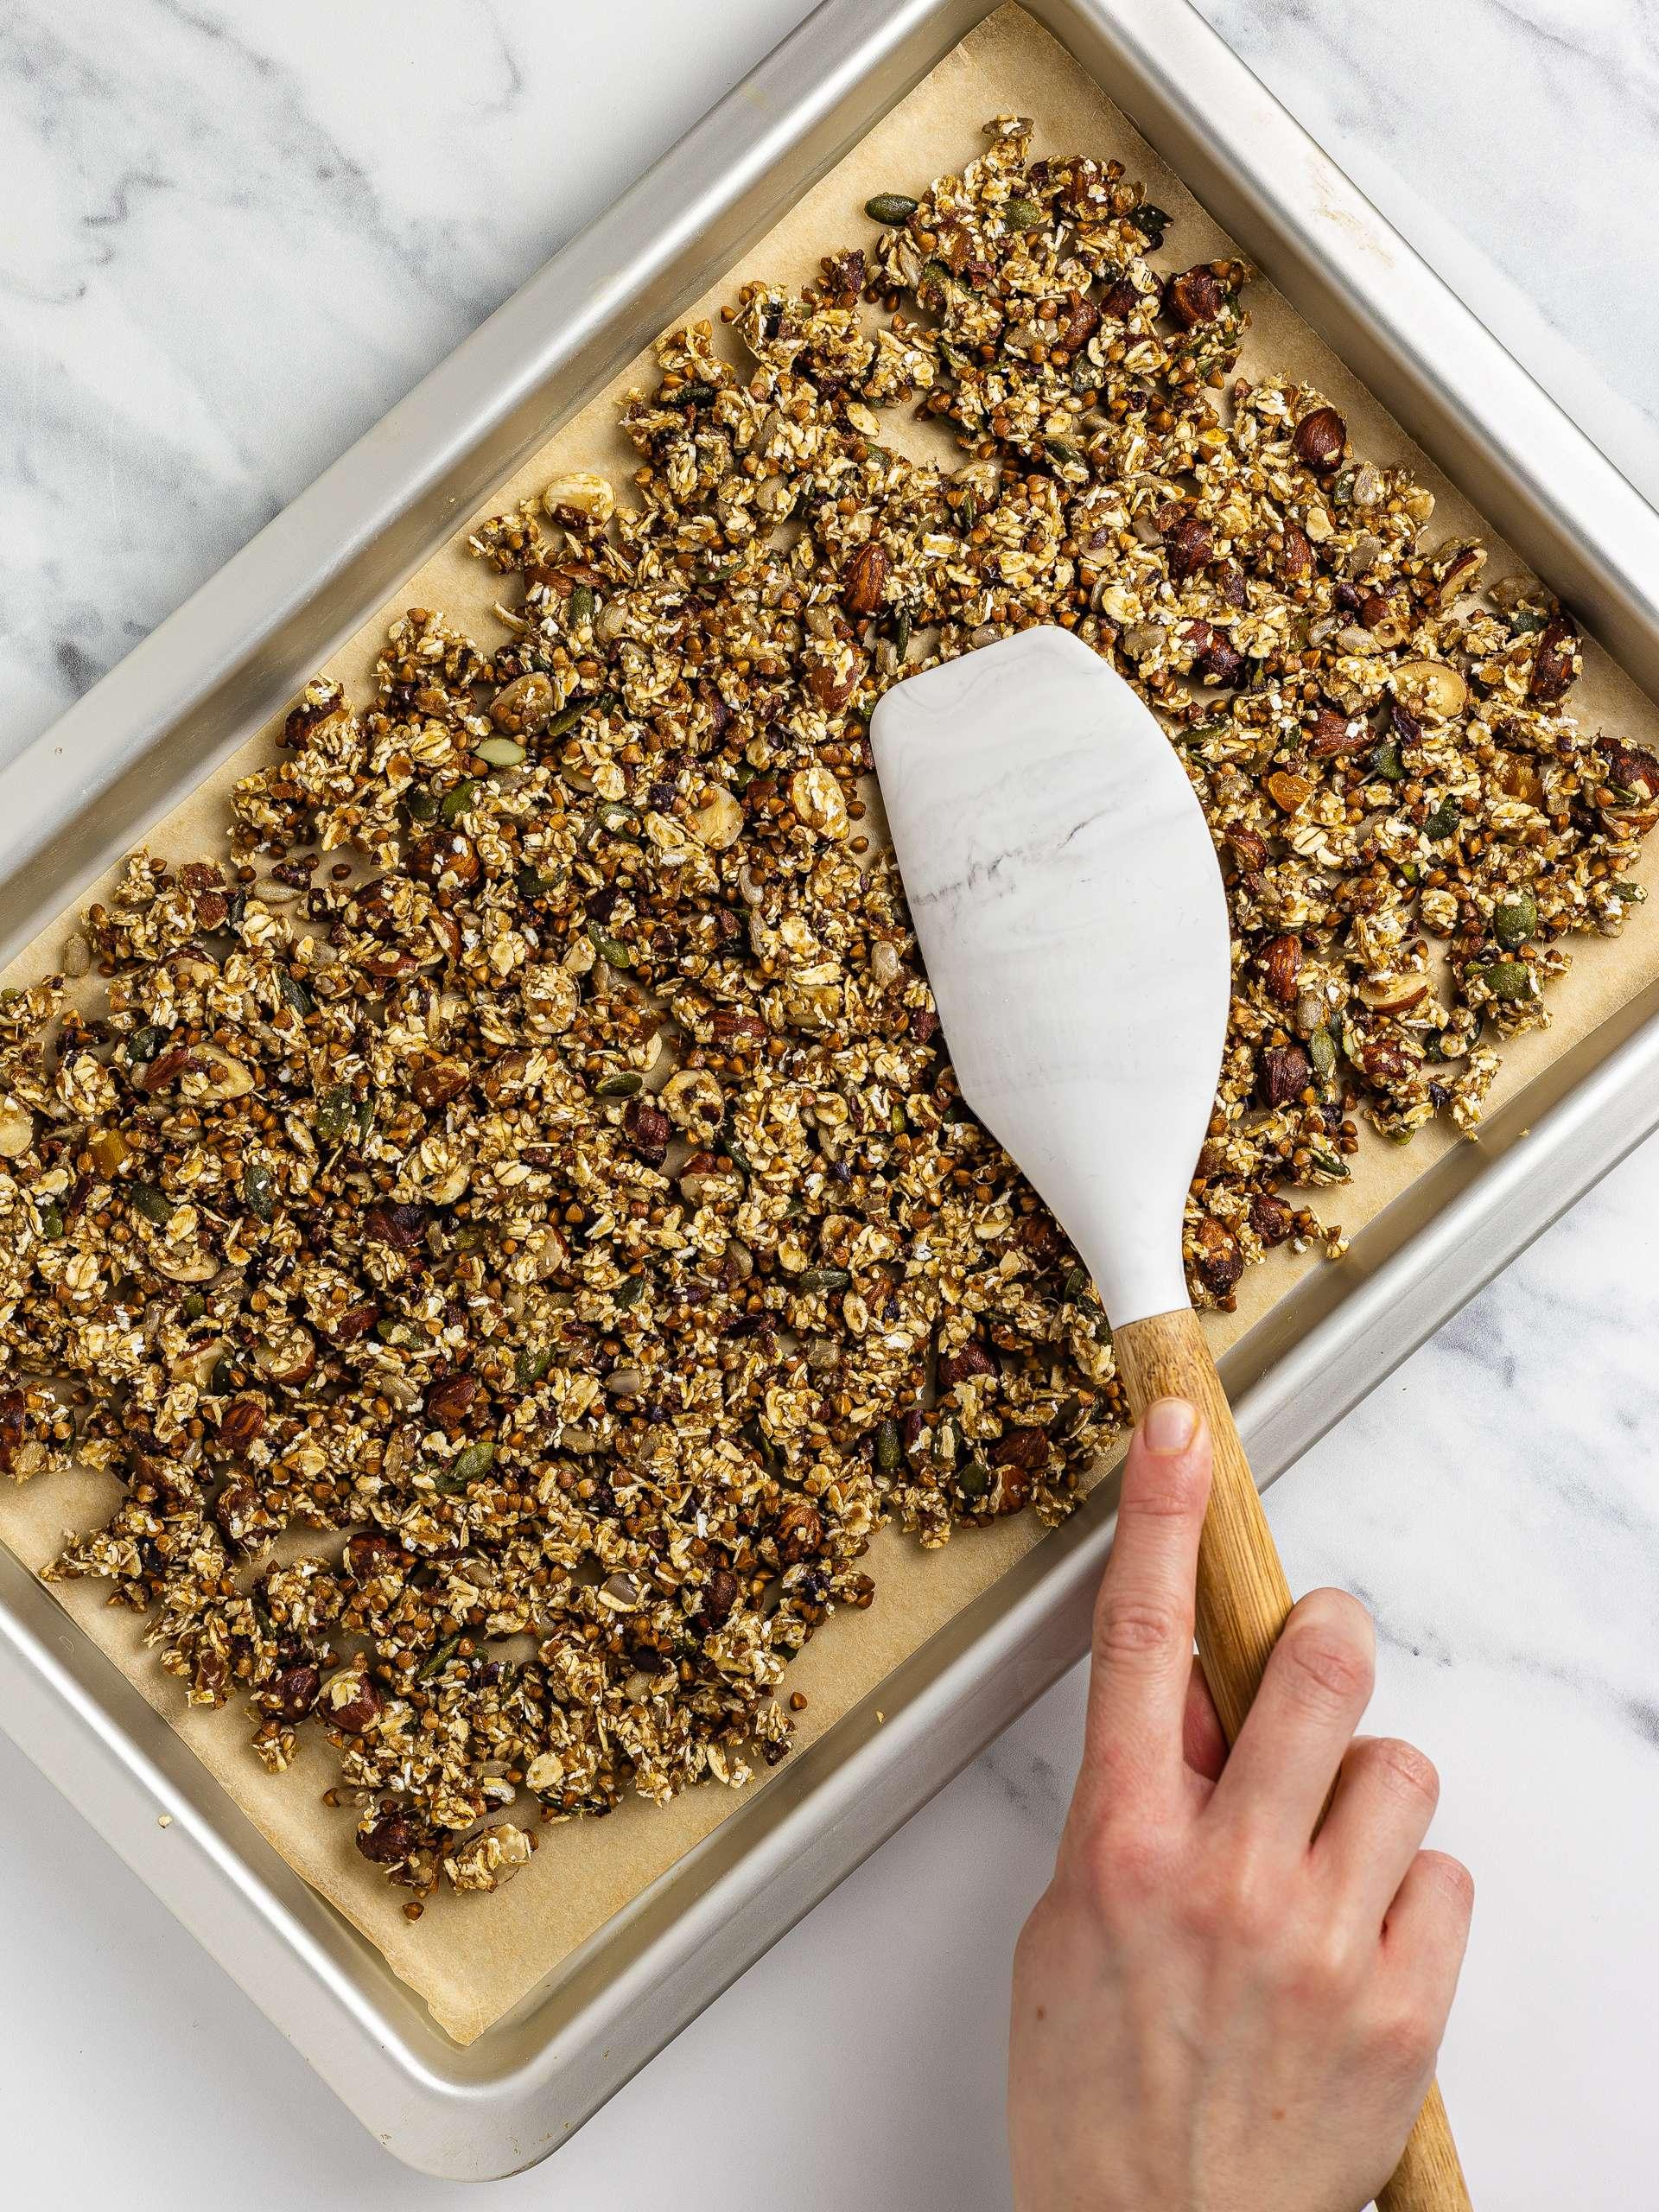 sugar-free granola spread over a baking tray